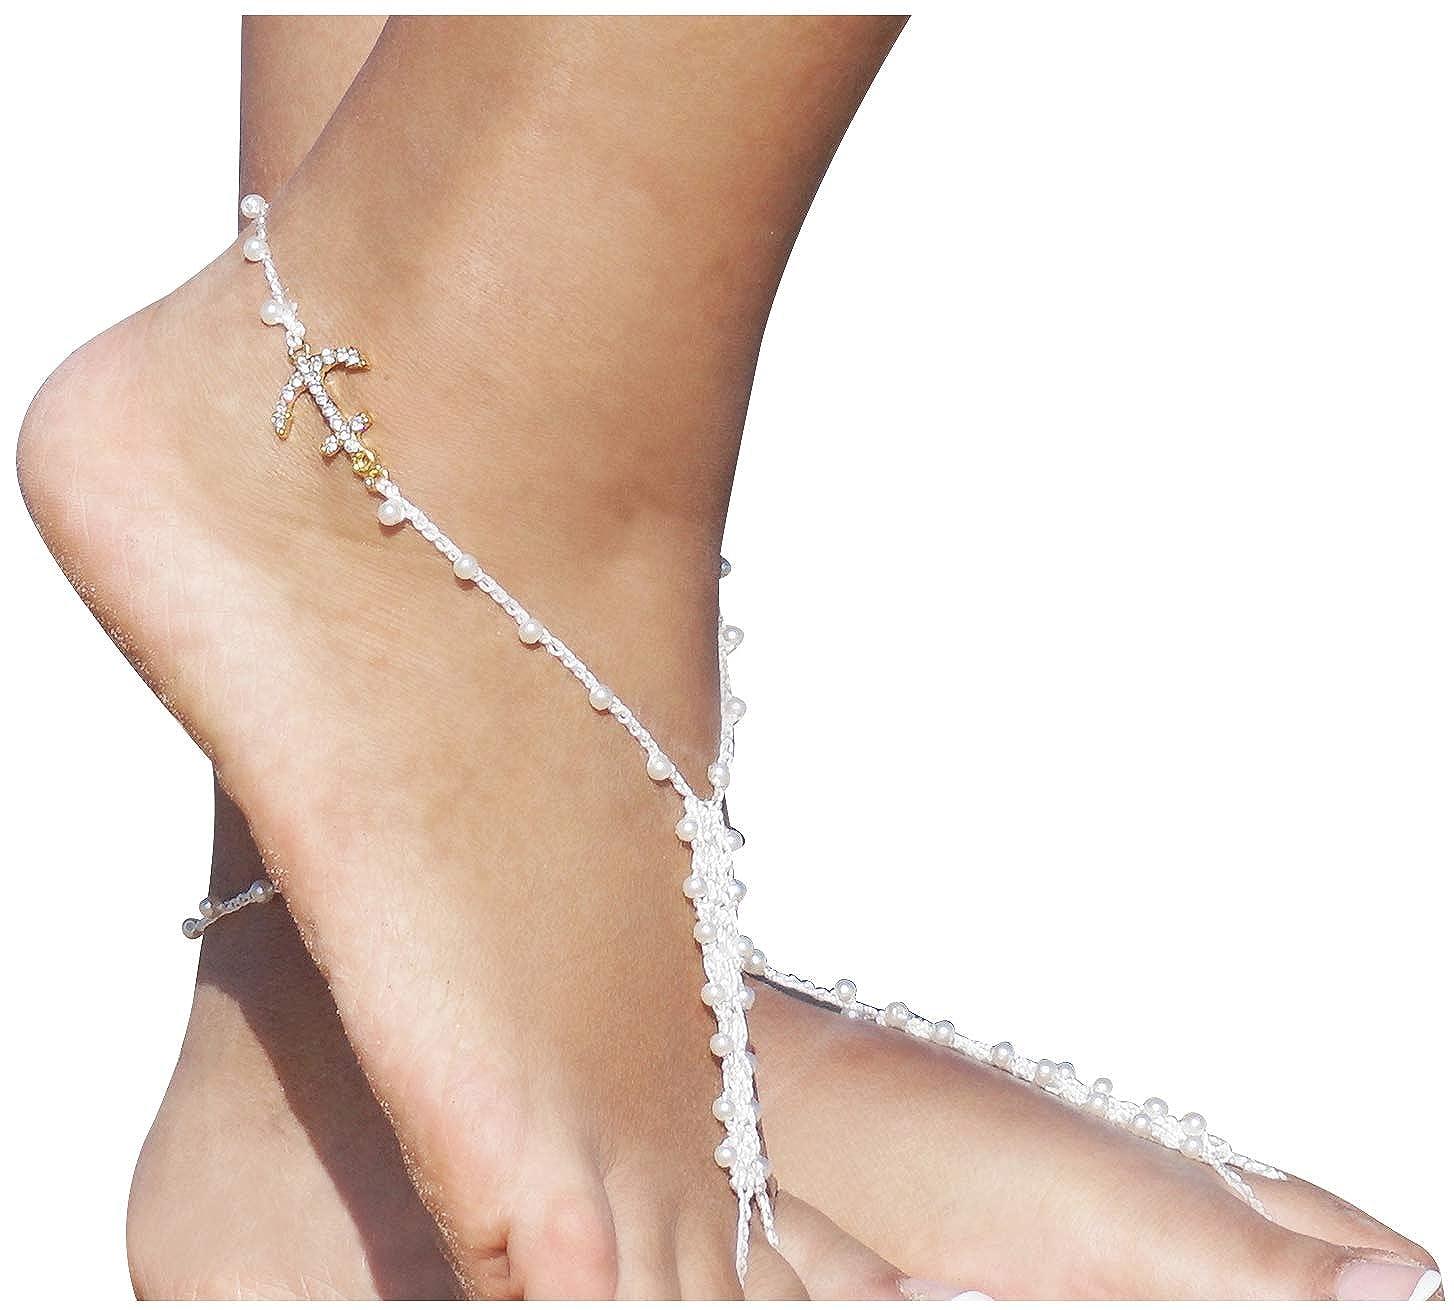 ddaef9e20129 Amazon.com  Bienvenu Beach Party Foot Jewelry Rhinestone Barefoot Sandals  Bridal Accessories One Size  Jewelry